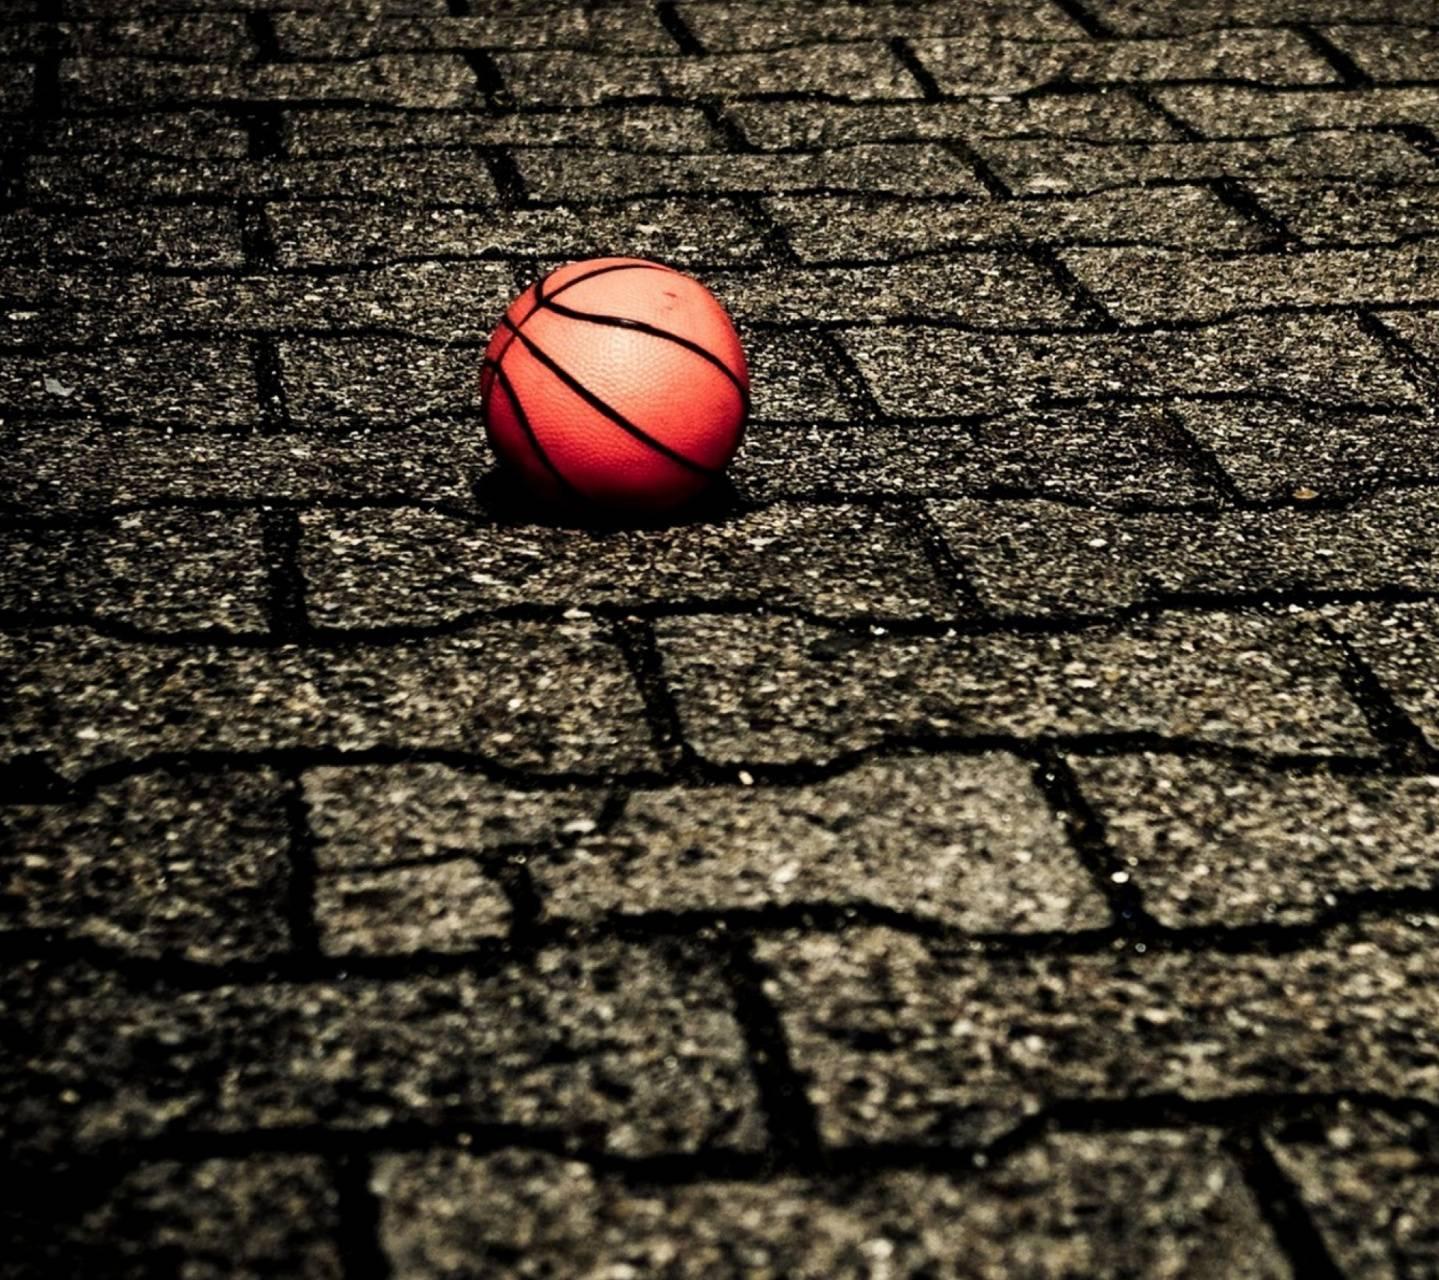 Ball on the Street